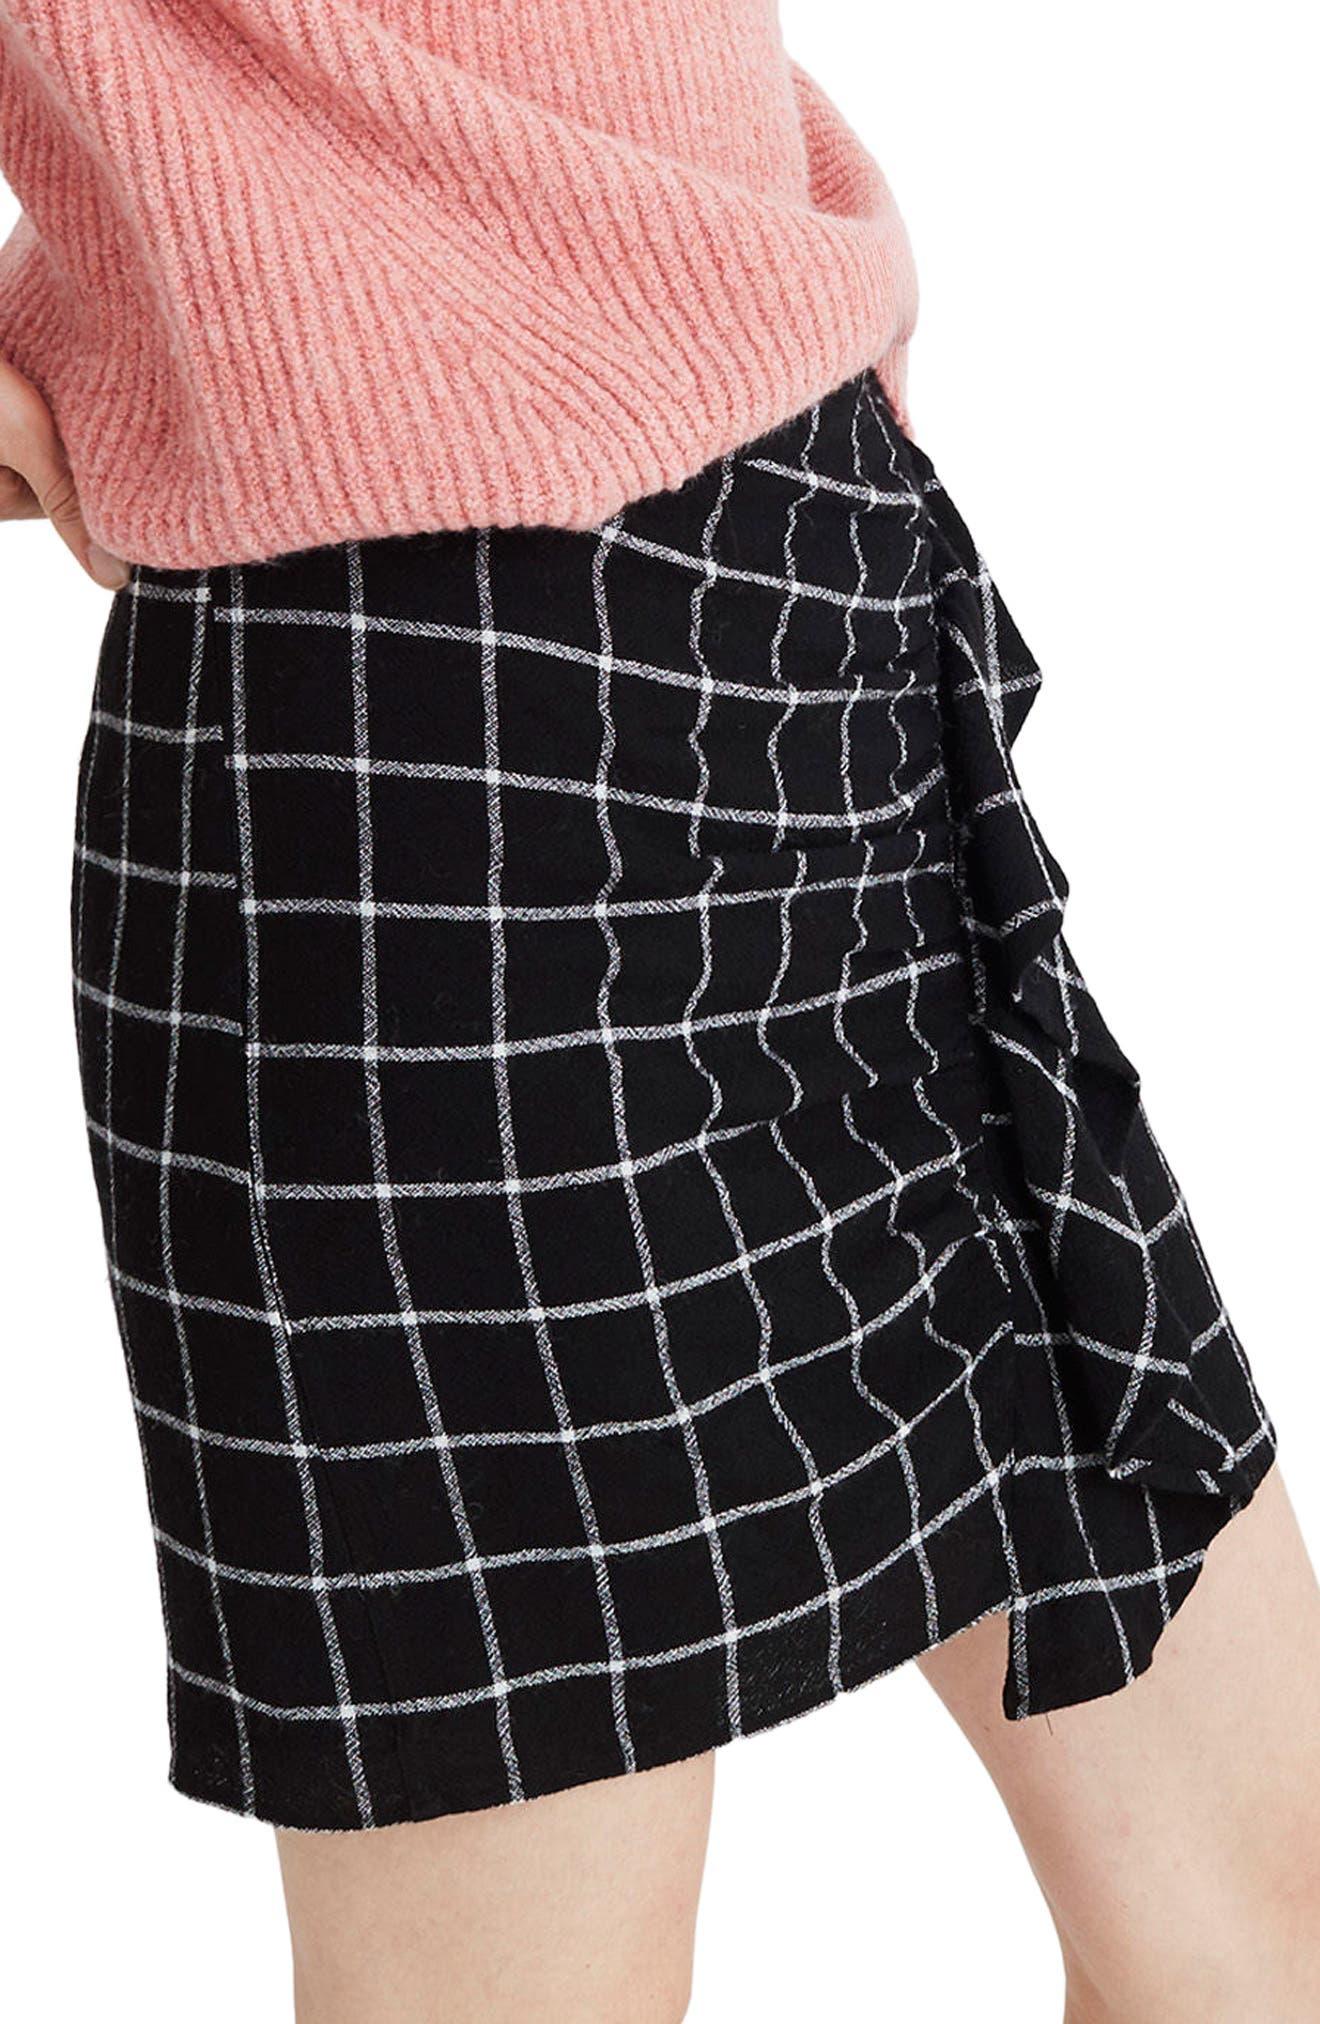 MADEWELL, Windowpane Ruffle Front Miniskirt, Alternate thumbnail 3, color, 009